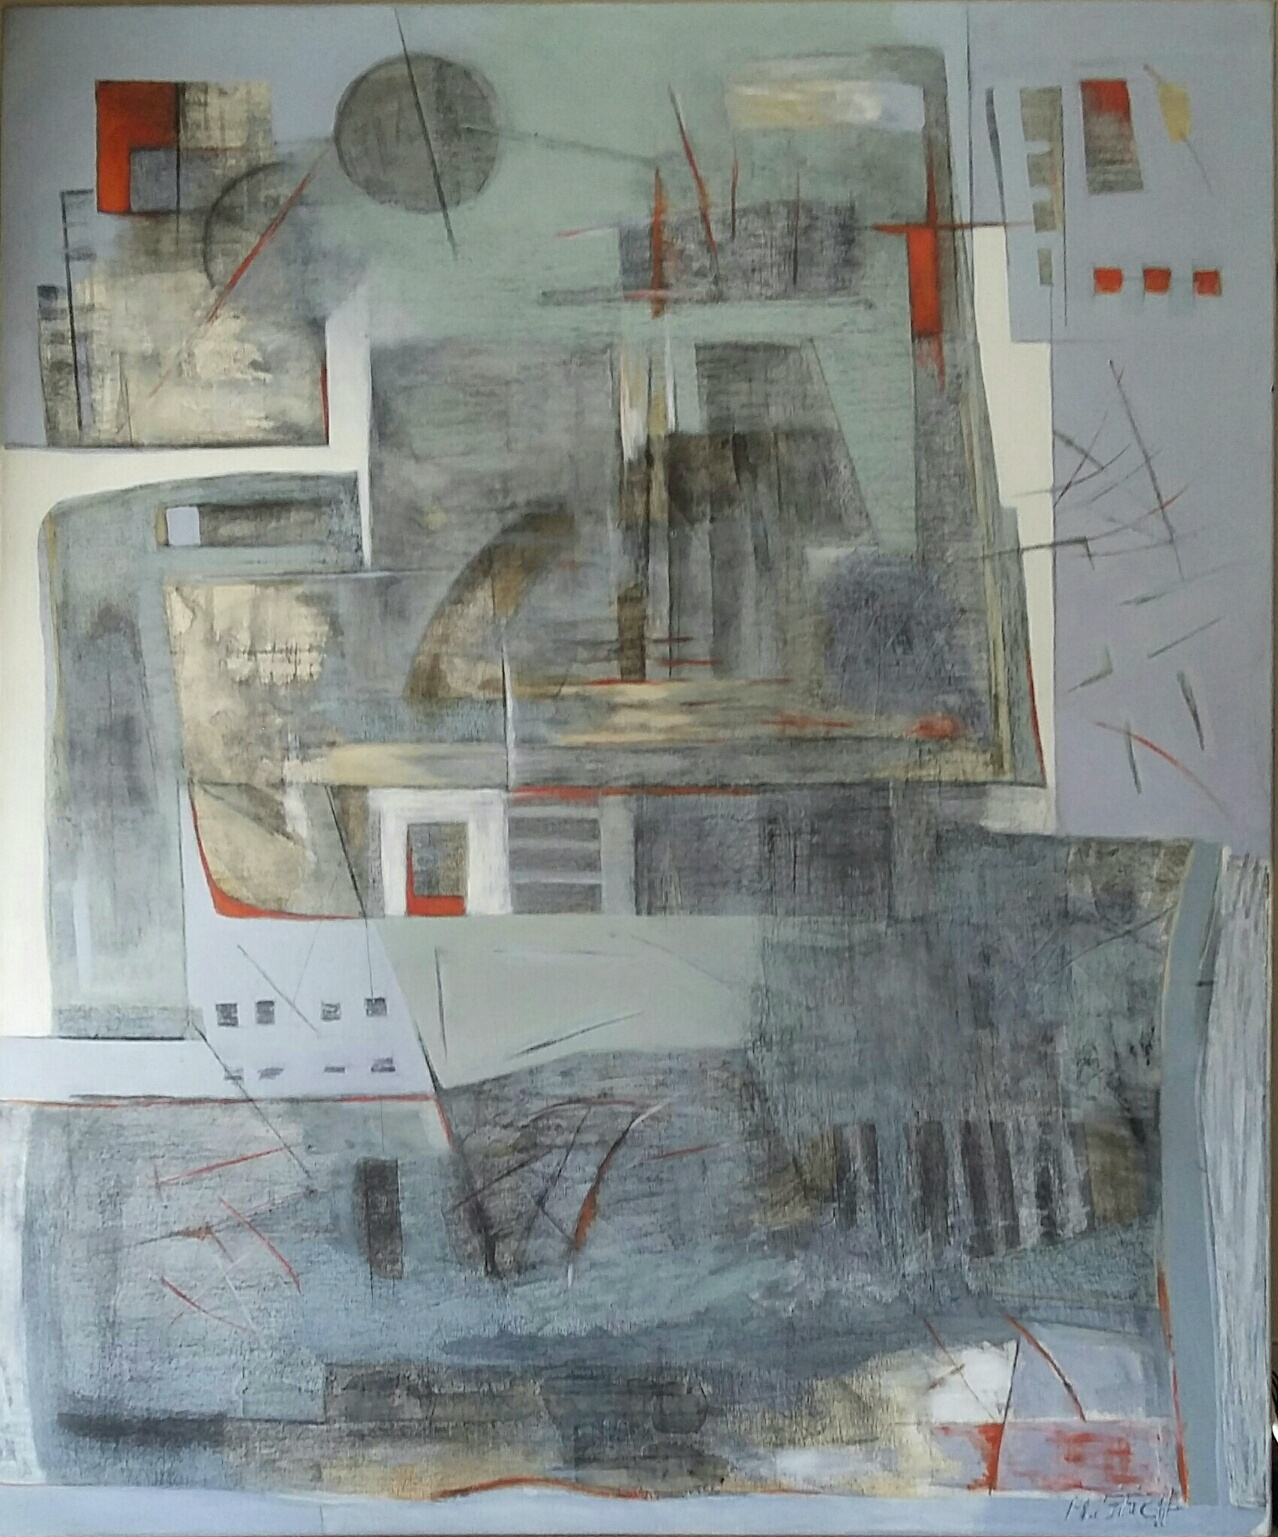 COSMICO (2007) - Mayra Lifischtz - Mayra Lifich